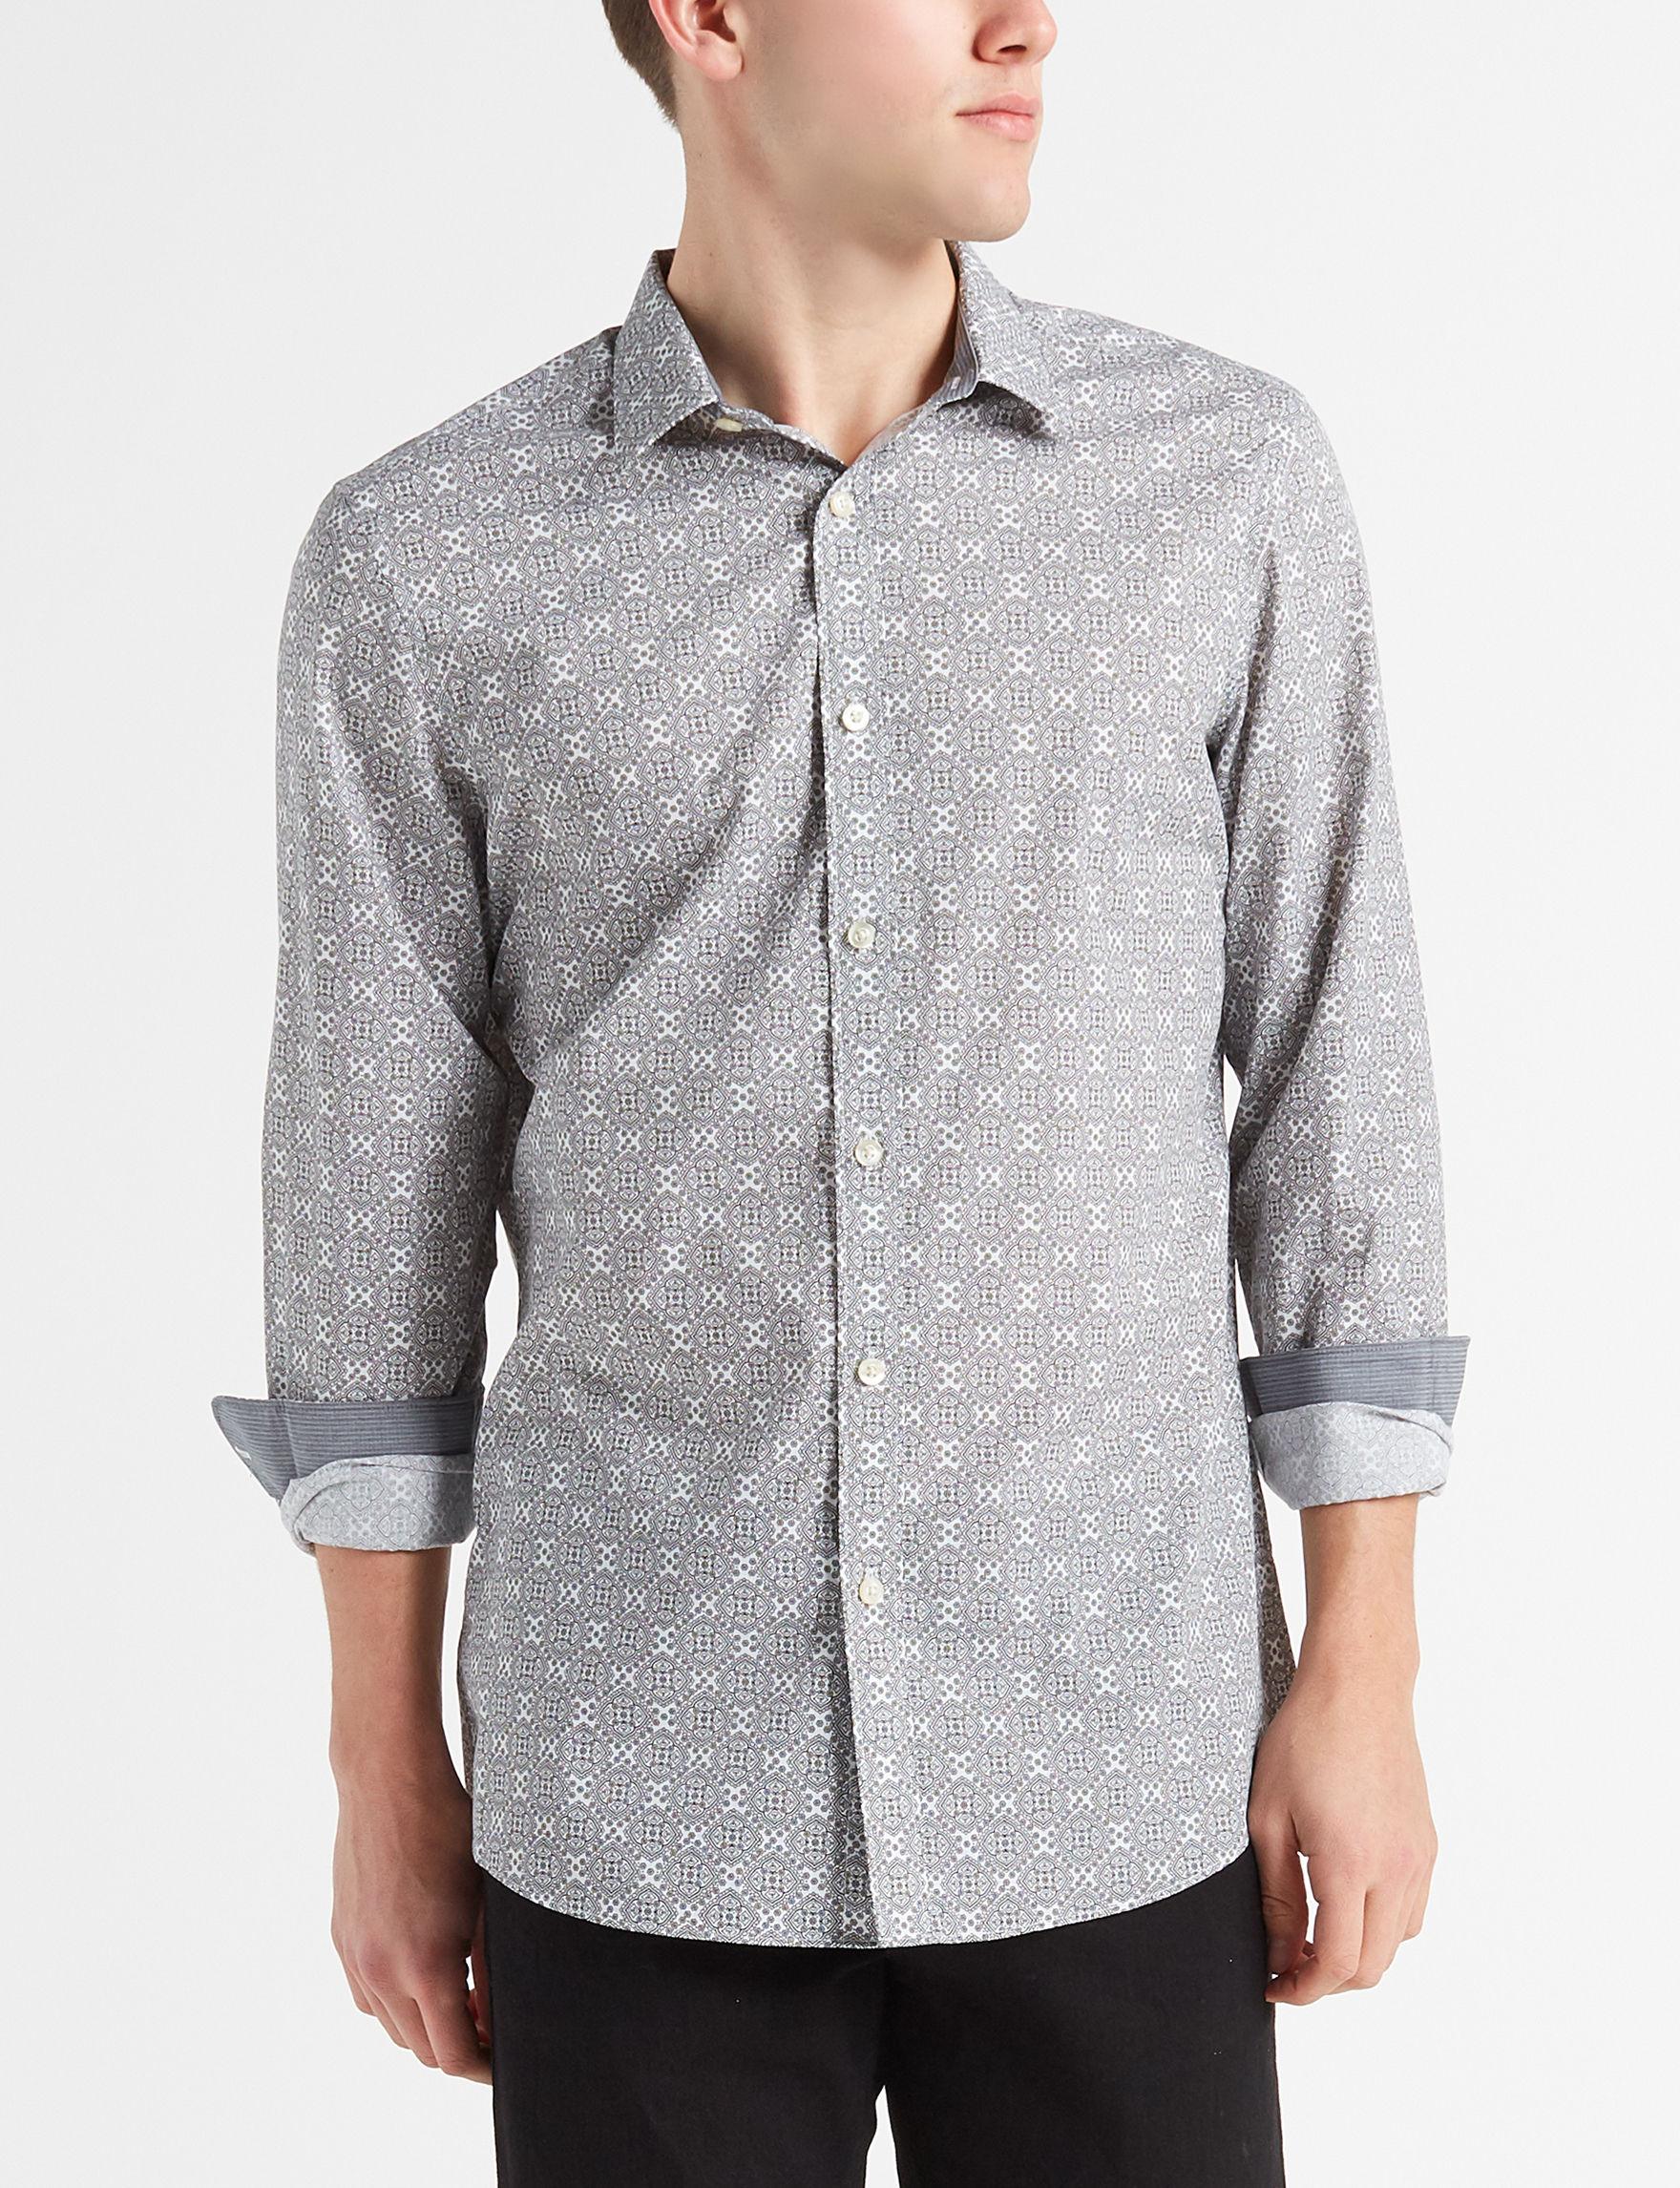 Axist White Casual Button Down Shirts